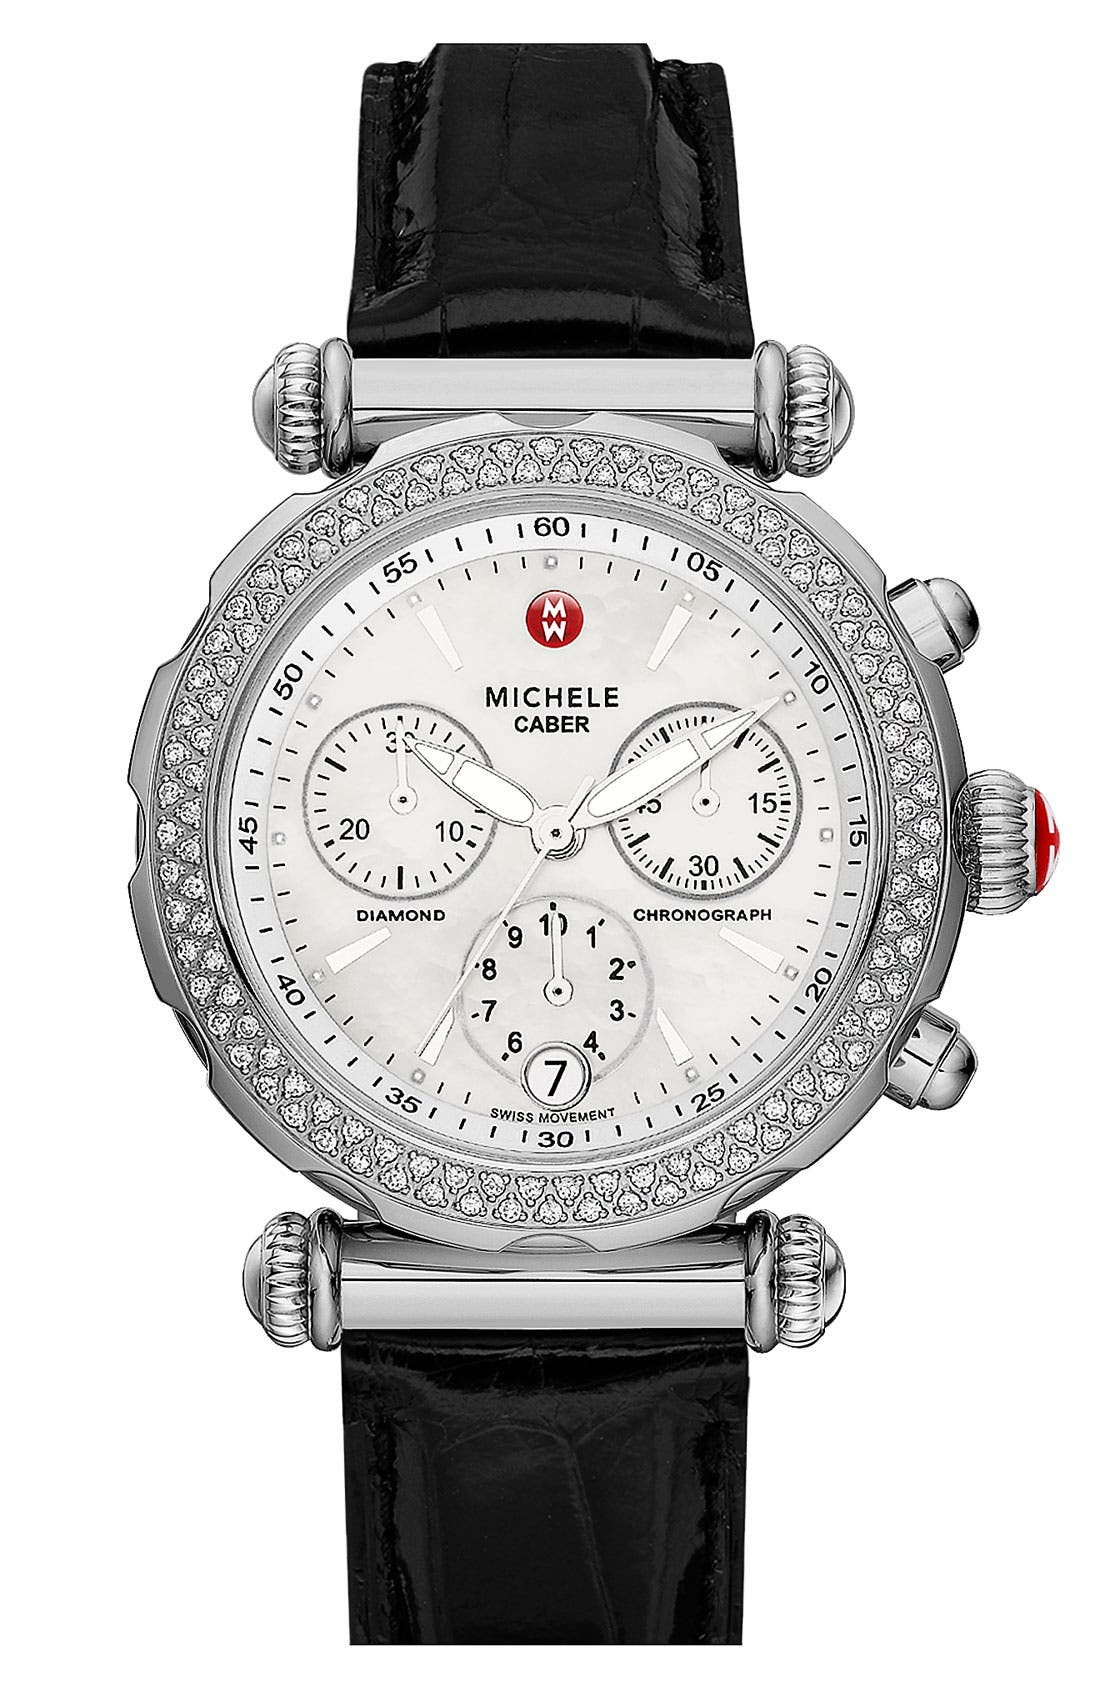 Alternate Image 1 Selected - MICHELE 'Caber Sport' Customizable Watch